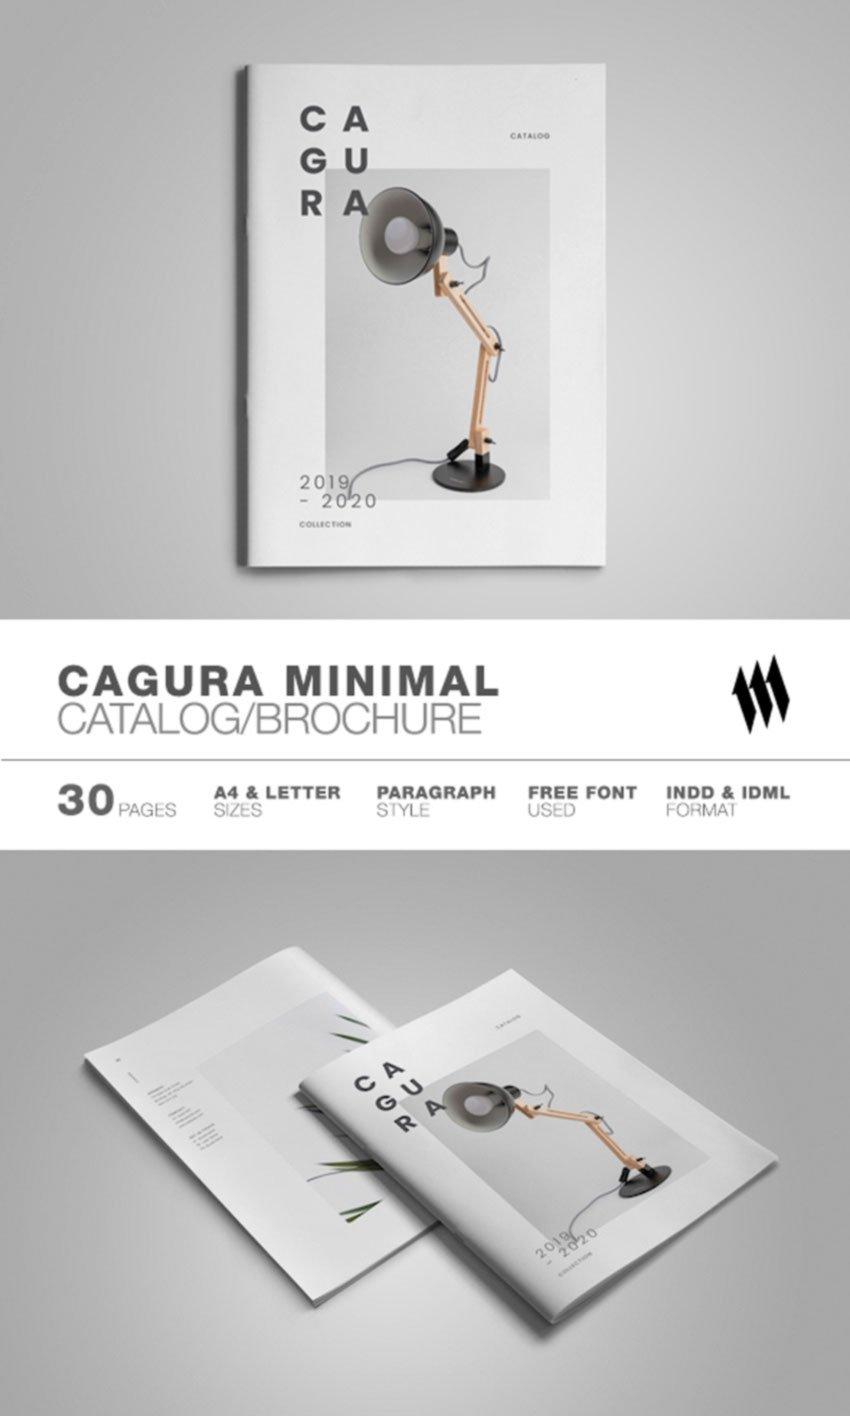 Minimal Catalog Brochure Template